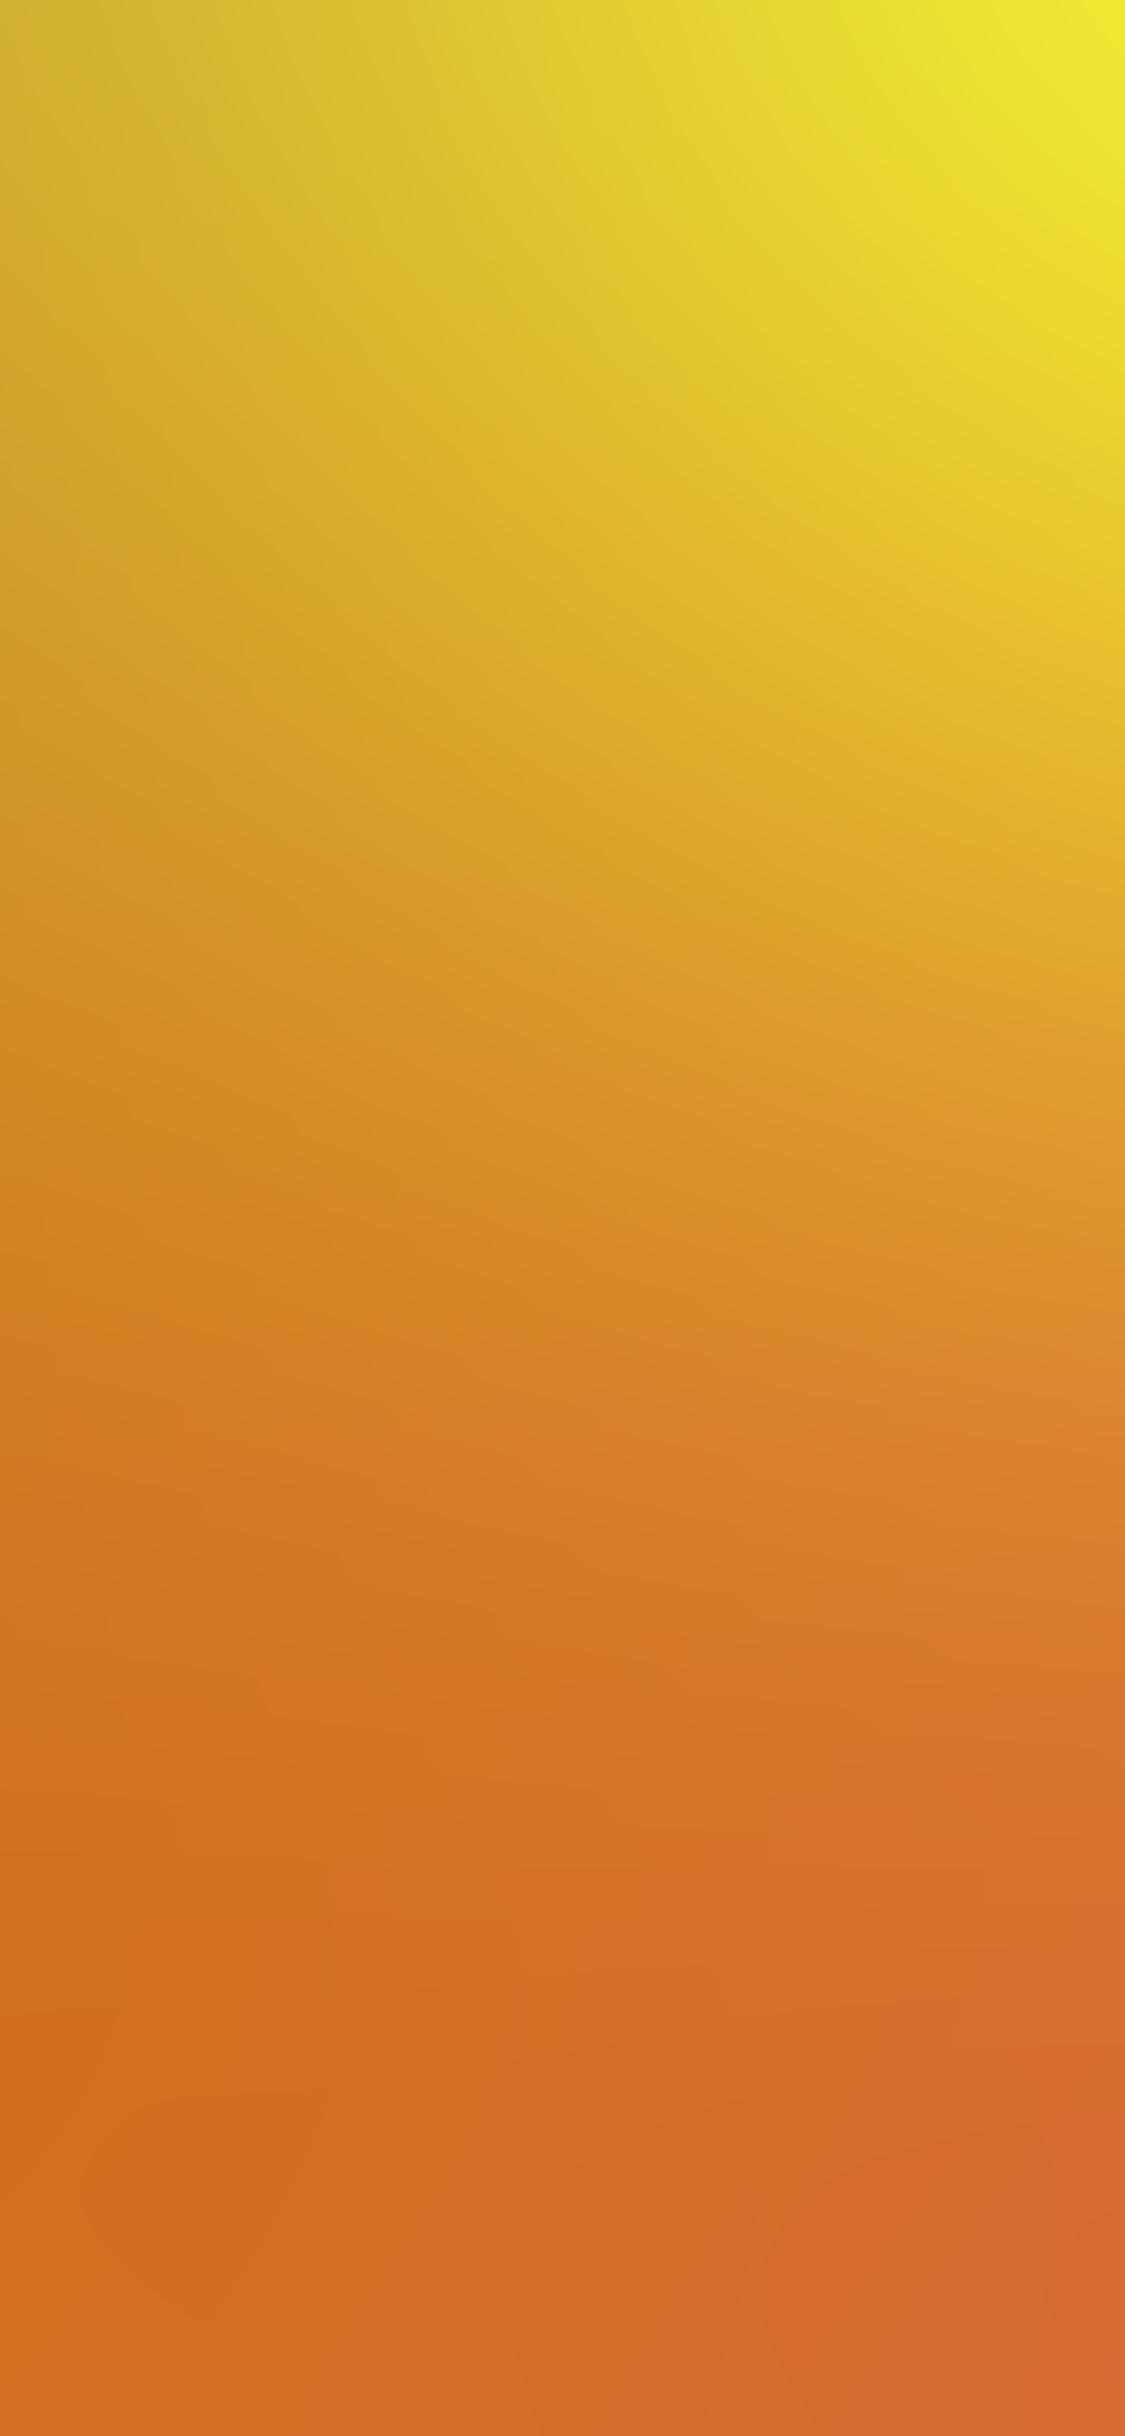 iPhonexpapers.com-Apple-iPhone-wallpaper-sm89-orange-yellow-blur-gradation